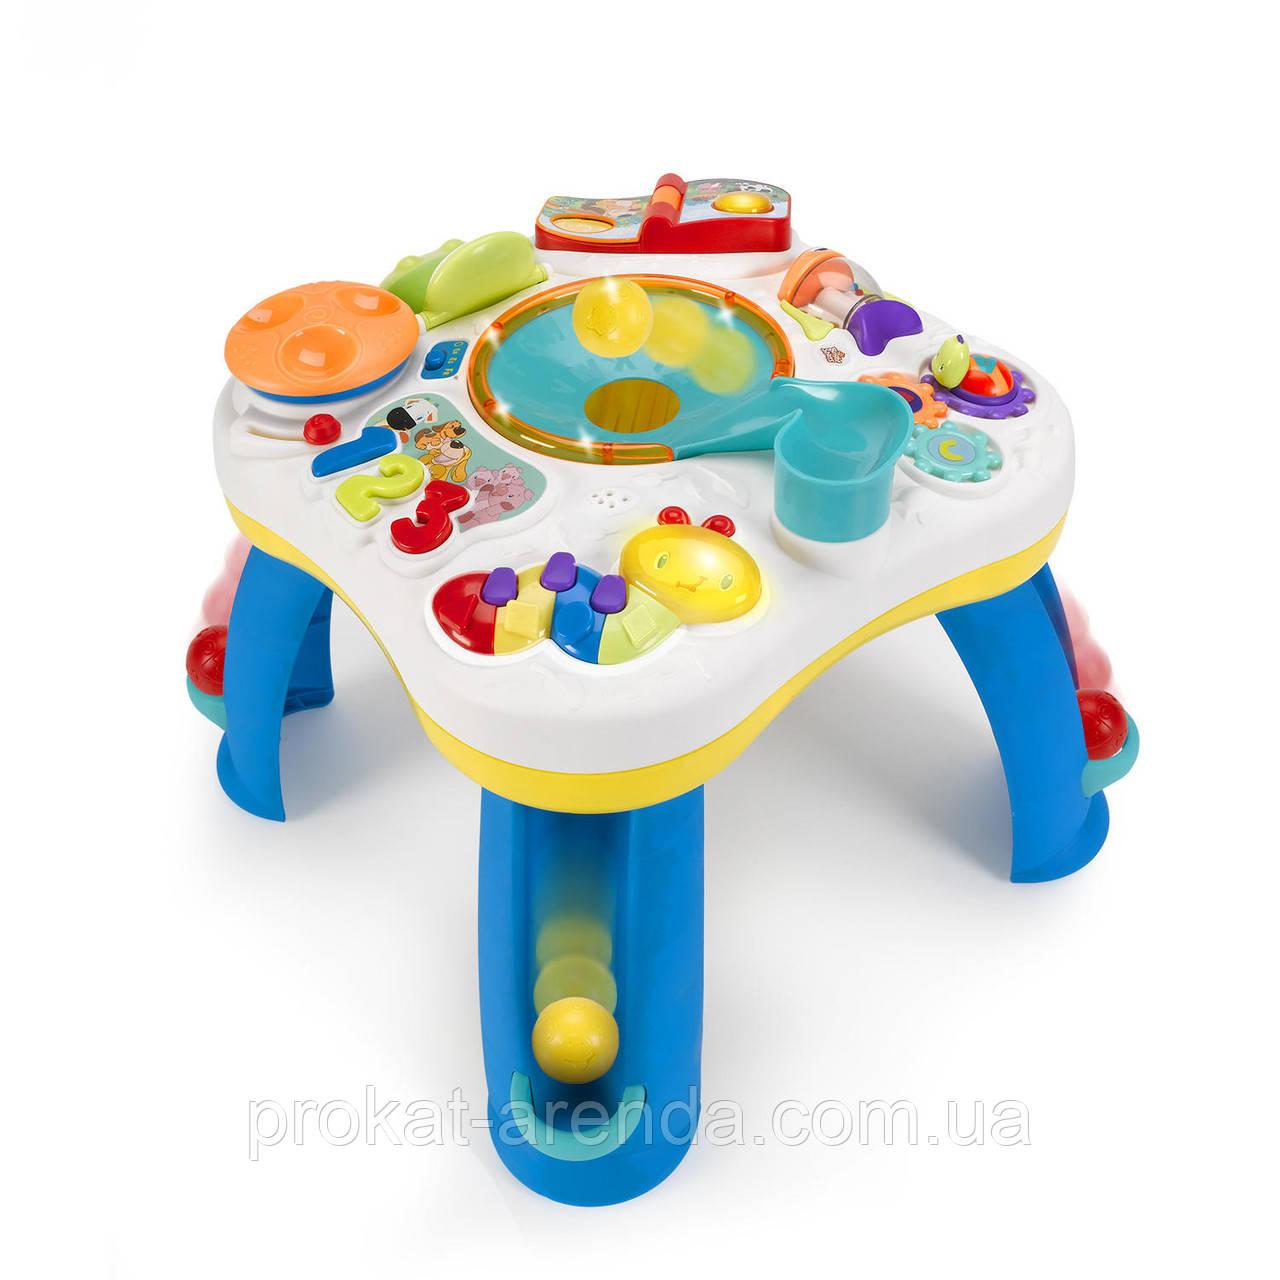 "Музыкальный столик "" Шустрые мячики"" Bright Starts"